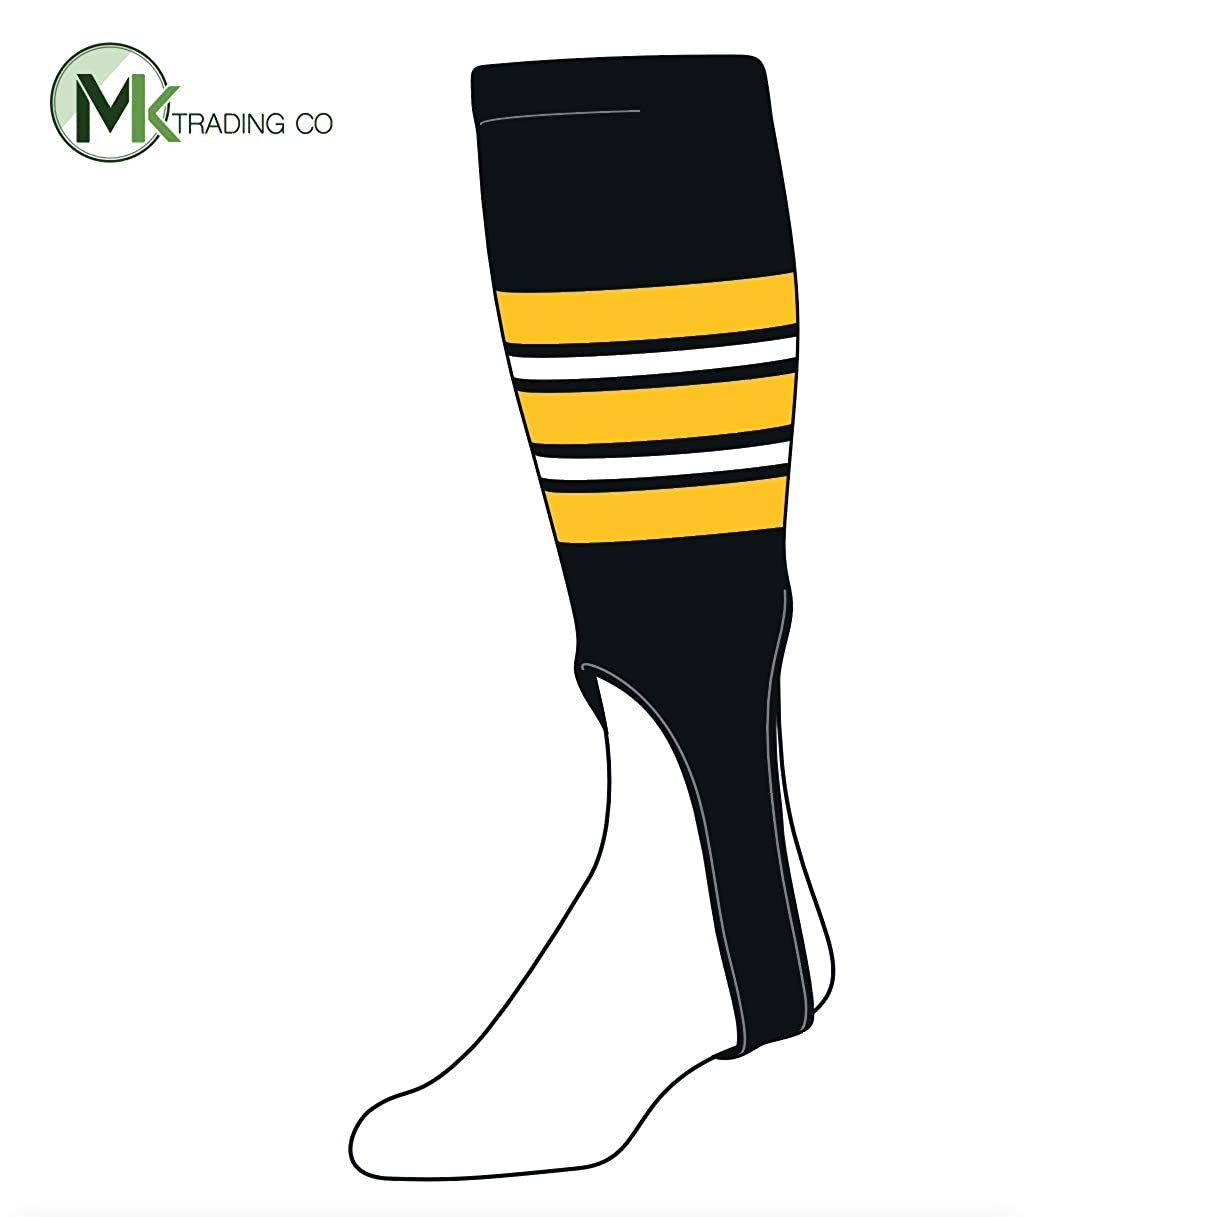 TCK Socks SOCKSHOSIERY メンズ US サイズ: Large 19 US inch TCK メンズ (16+ years) B07MWJ29CW, 眠りのひろば【ふとんの江崎】:3cfc0f53 --- cgt-tbc.fr